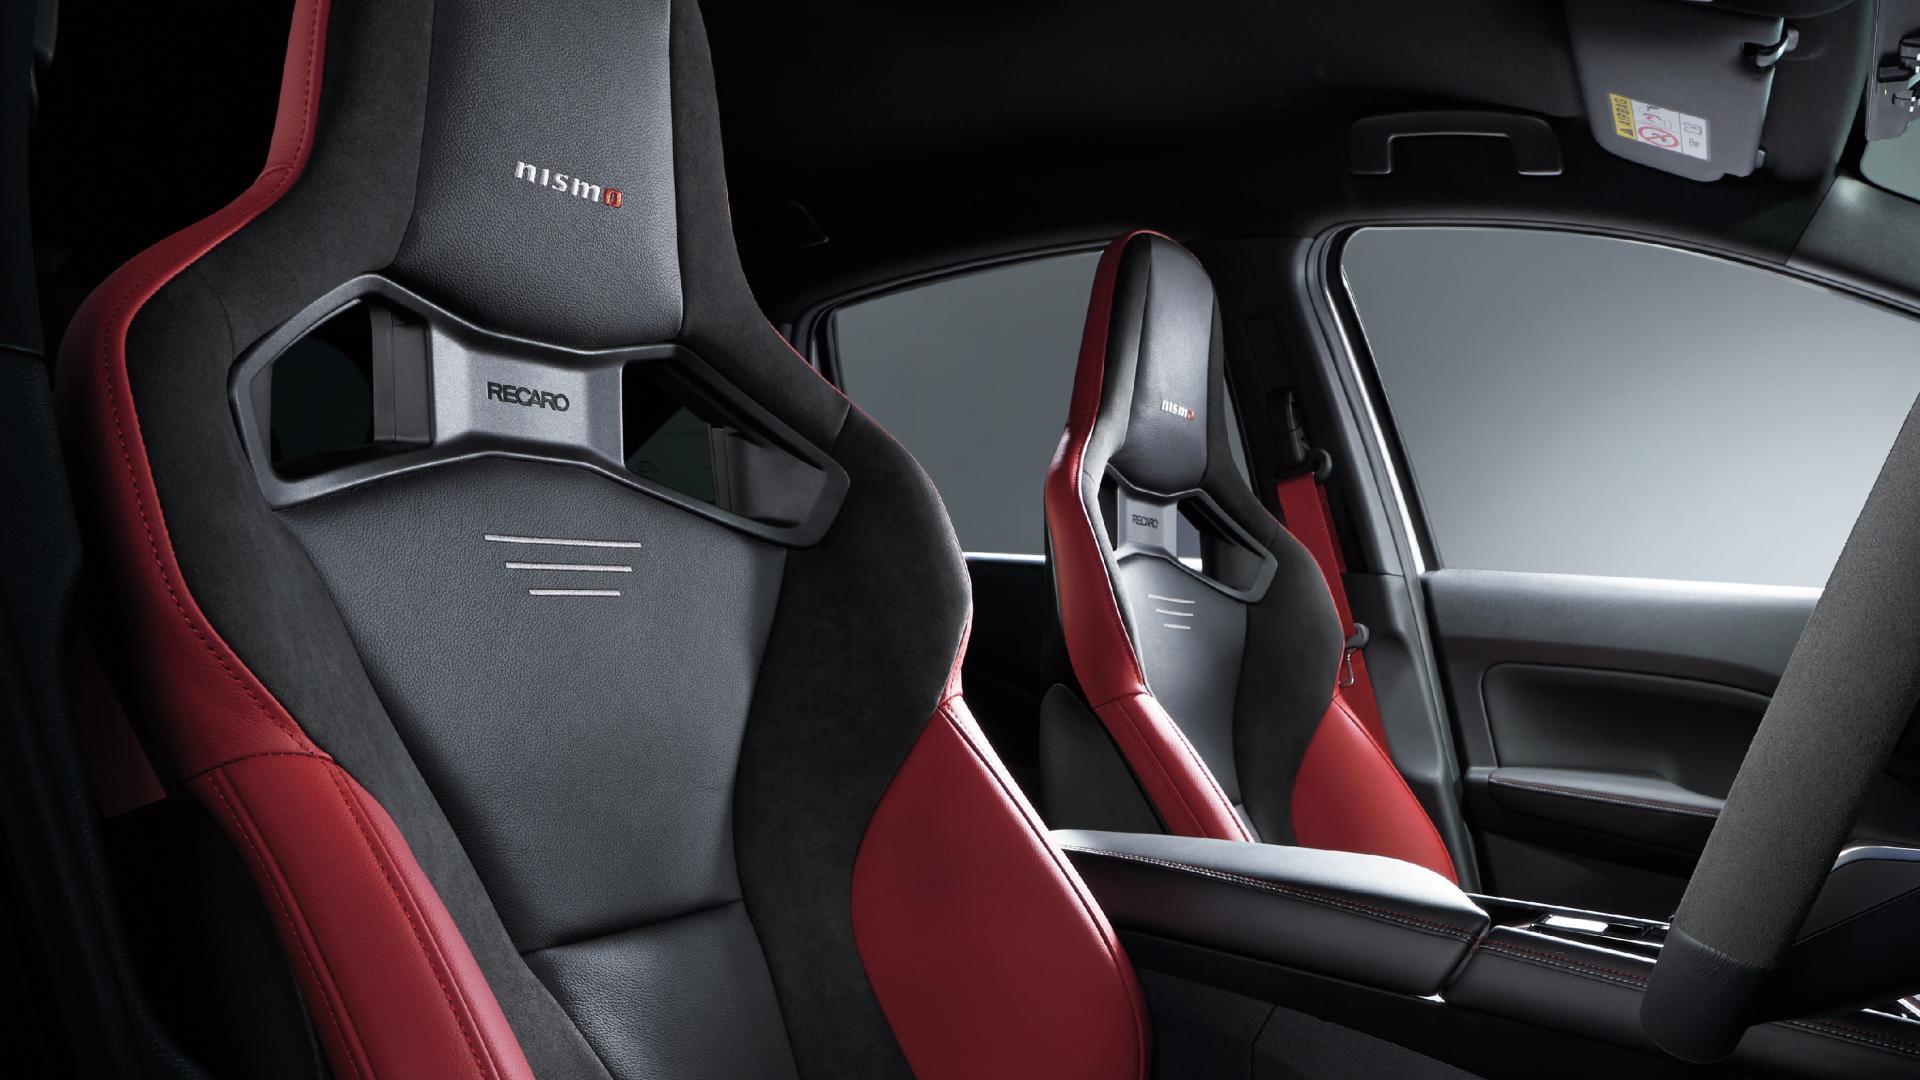 Recaro-stoelen Nissan Note Nismo (Japan)